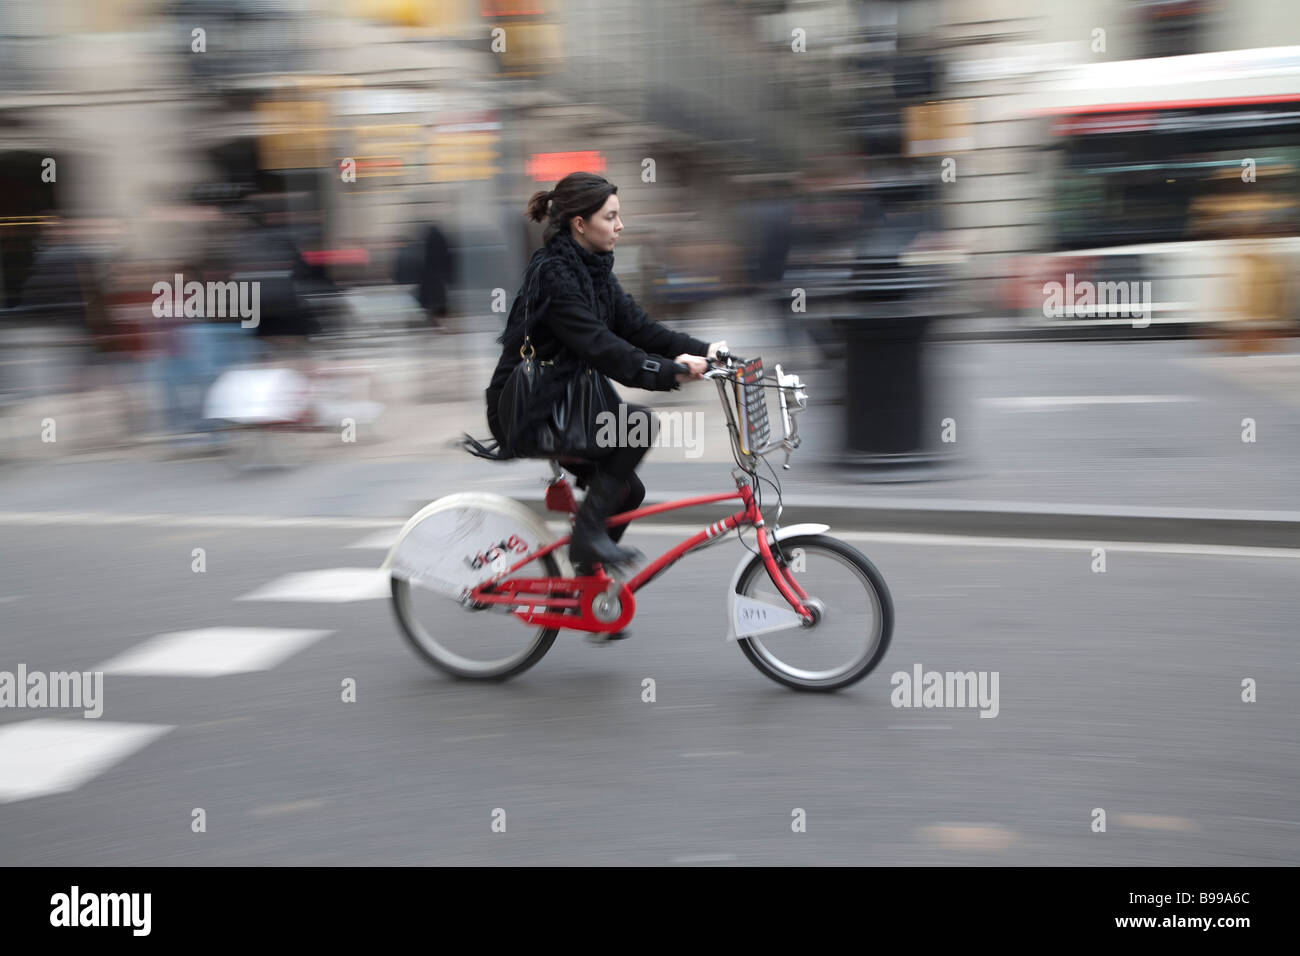 Rented Bicing Bicyle on La Rambla, Barcelona - Stock Image